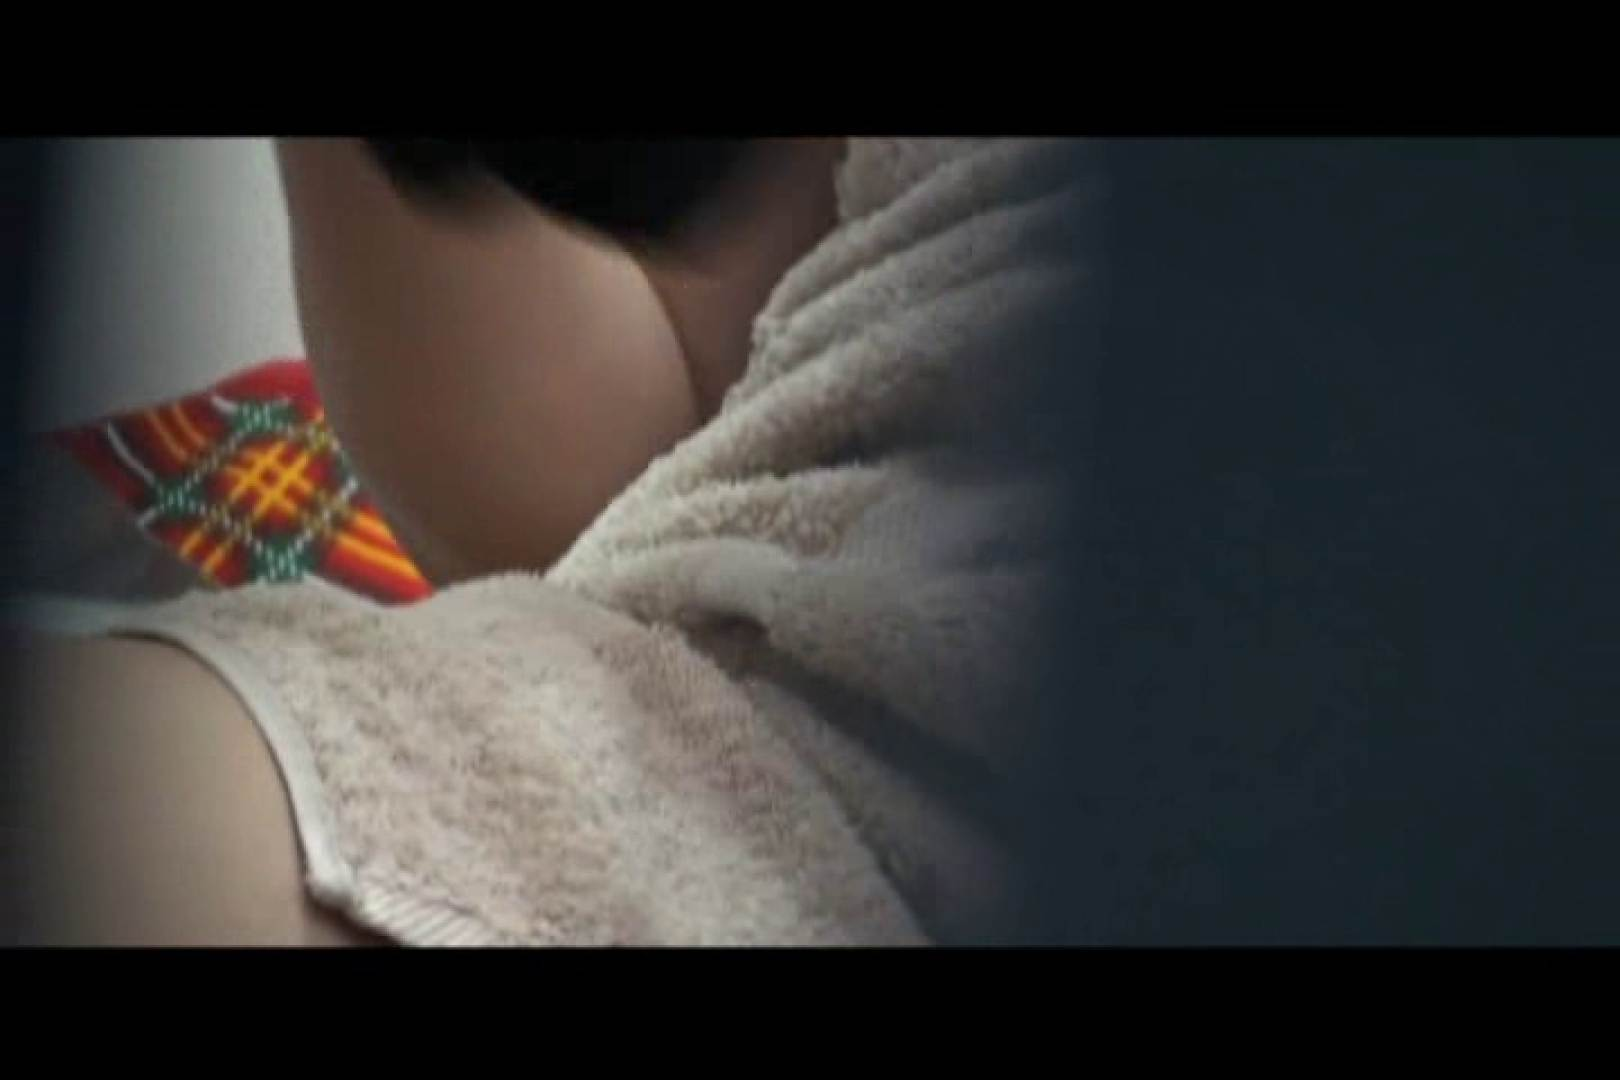 独占配信!無修正! 看護女子寮 vol.12 ナースのエロ動画 SEX無修正画像 78PIX 35